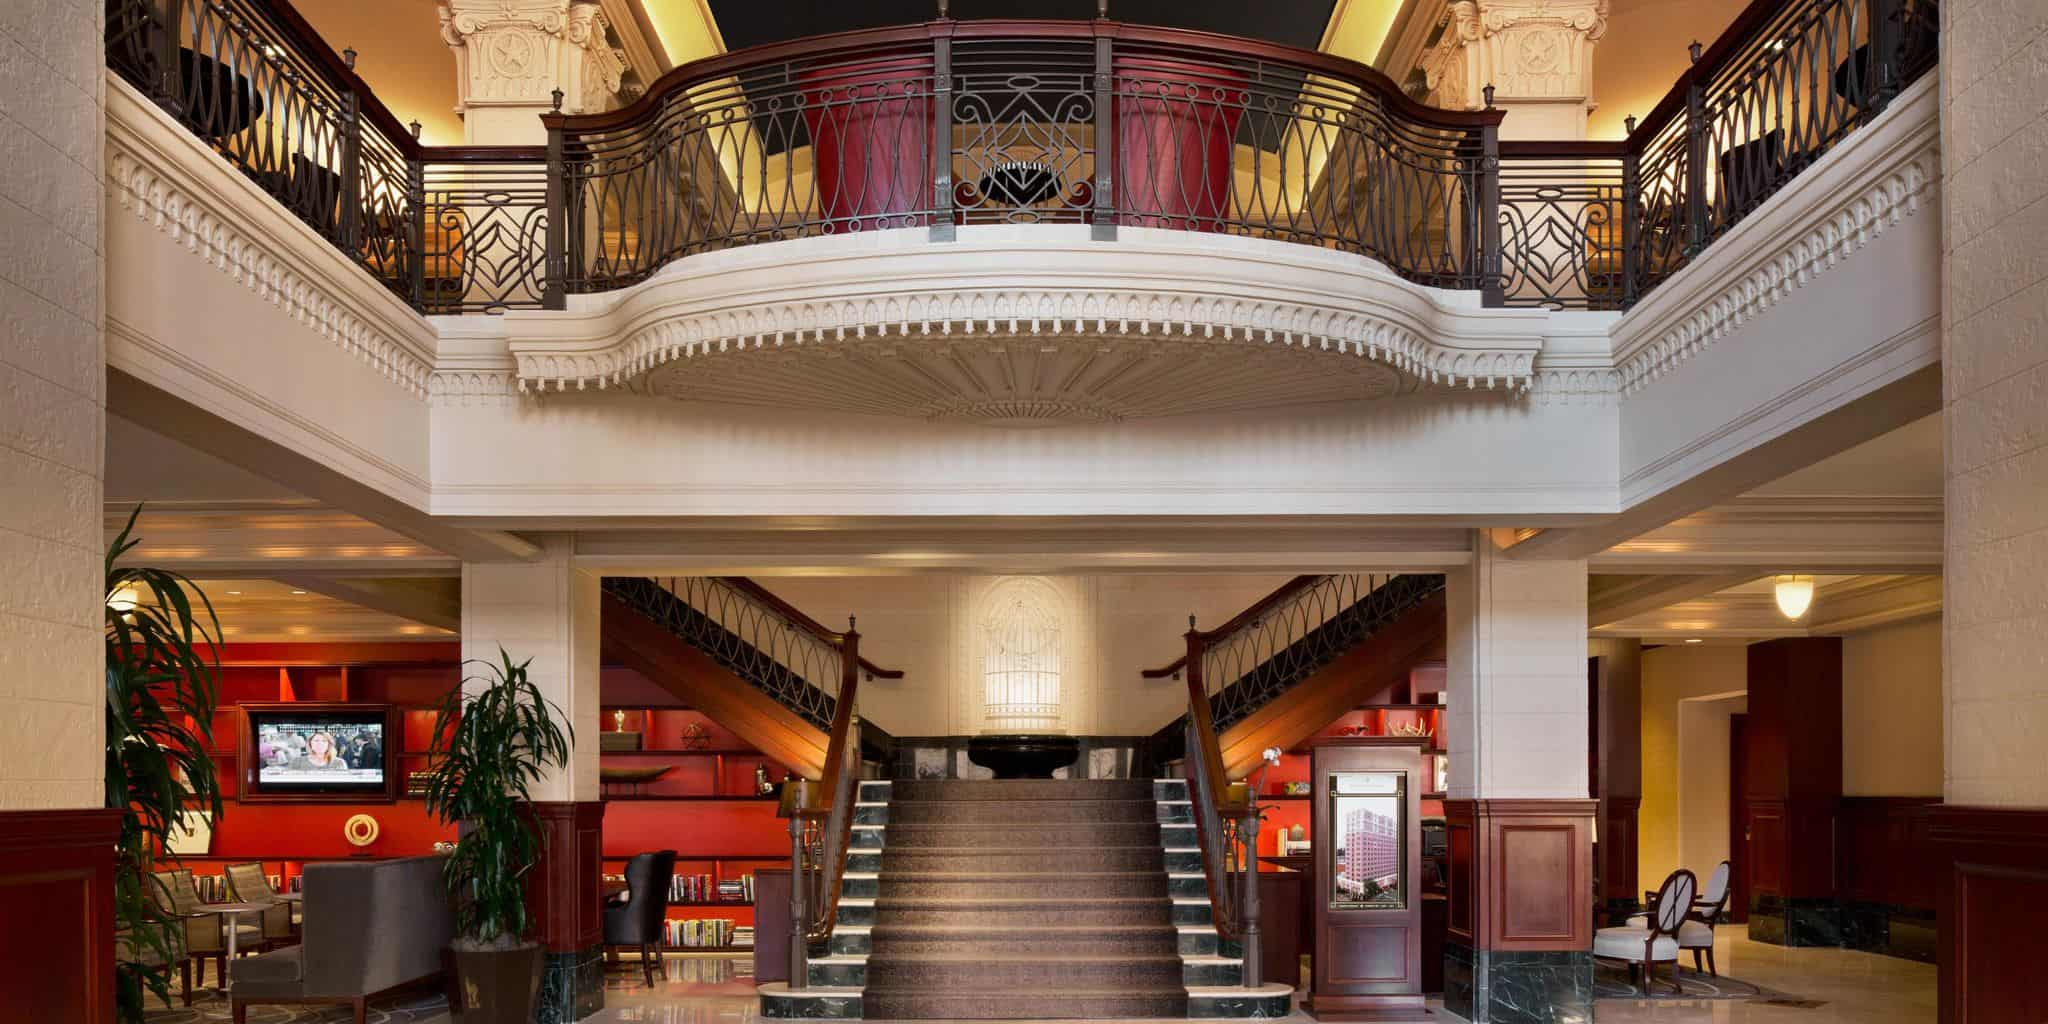 Hotel InterContinental Stephen F. Austin